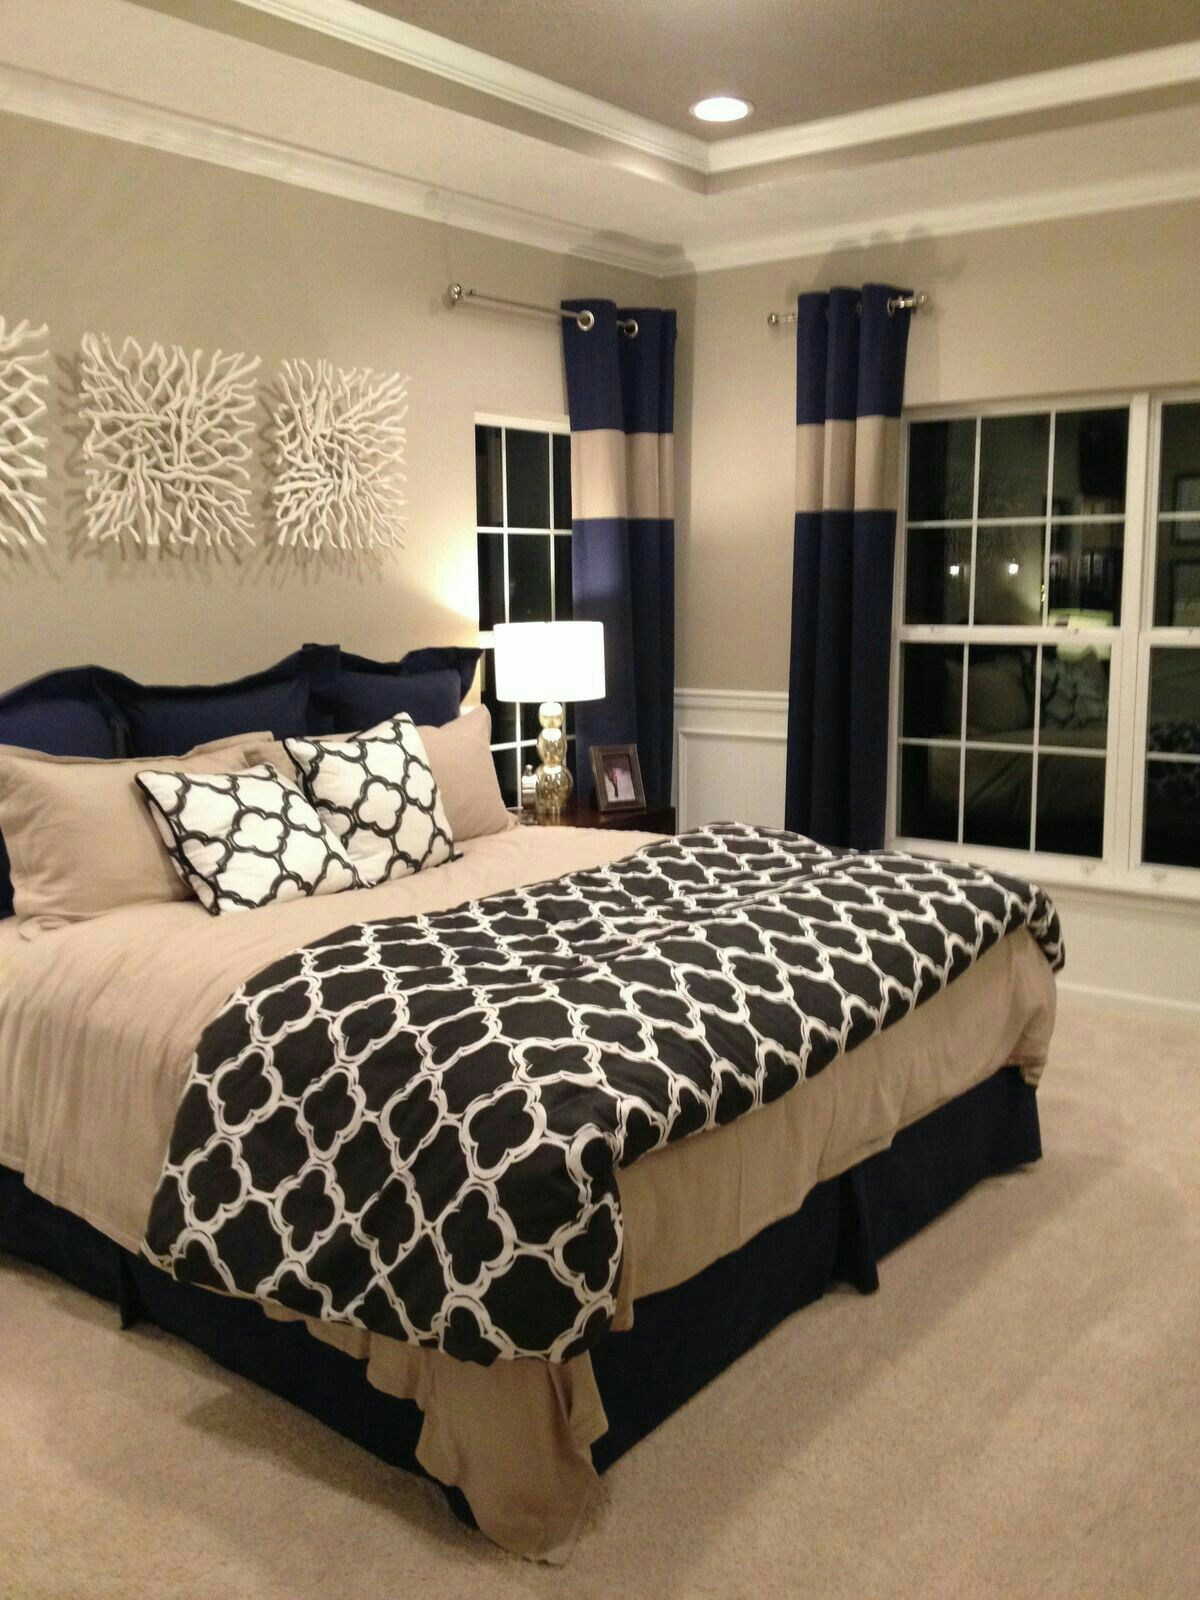 Couple Bedroom Design: Master Bedrooms Decor, Master Bedroom Colors